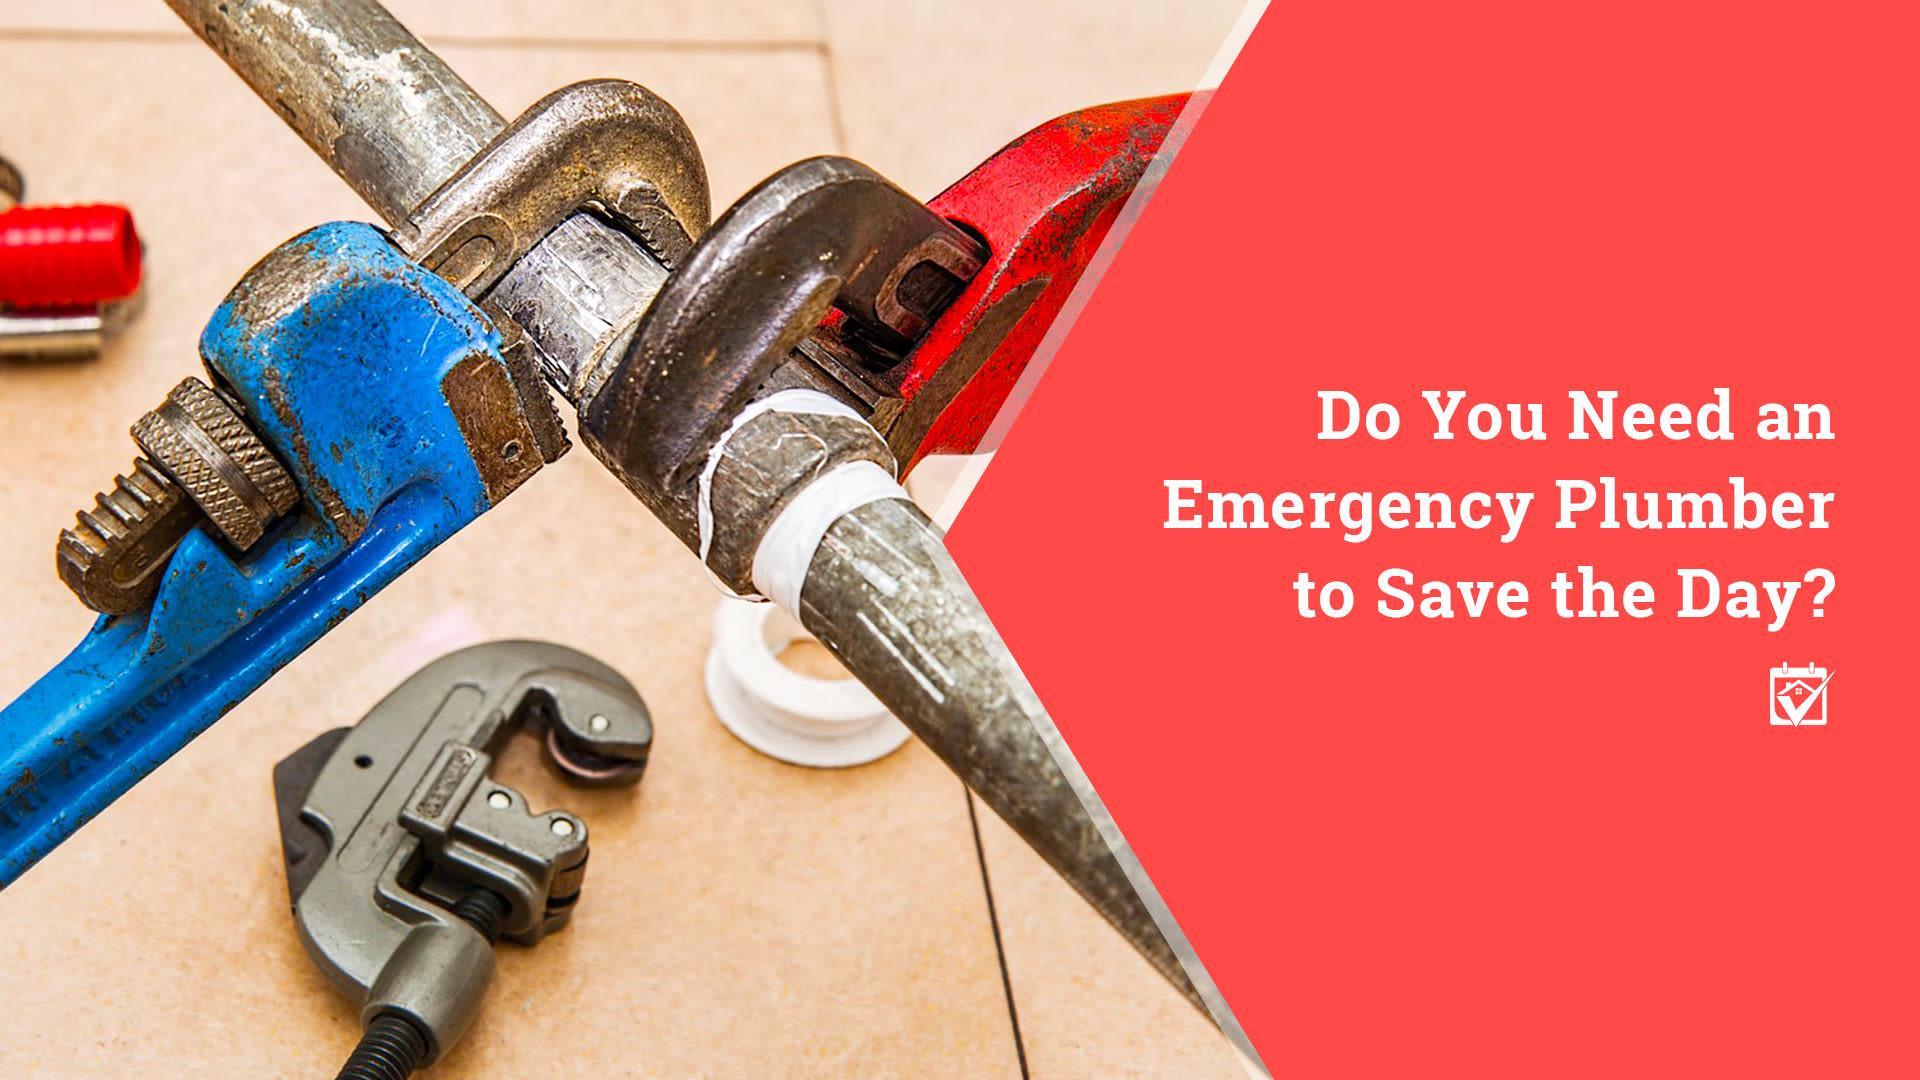 Need an Emergency Plumber?